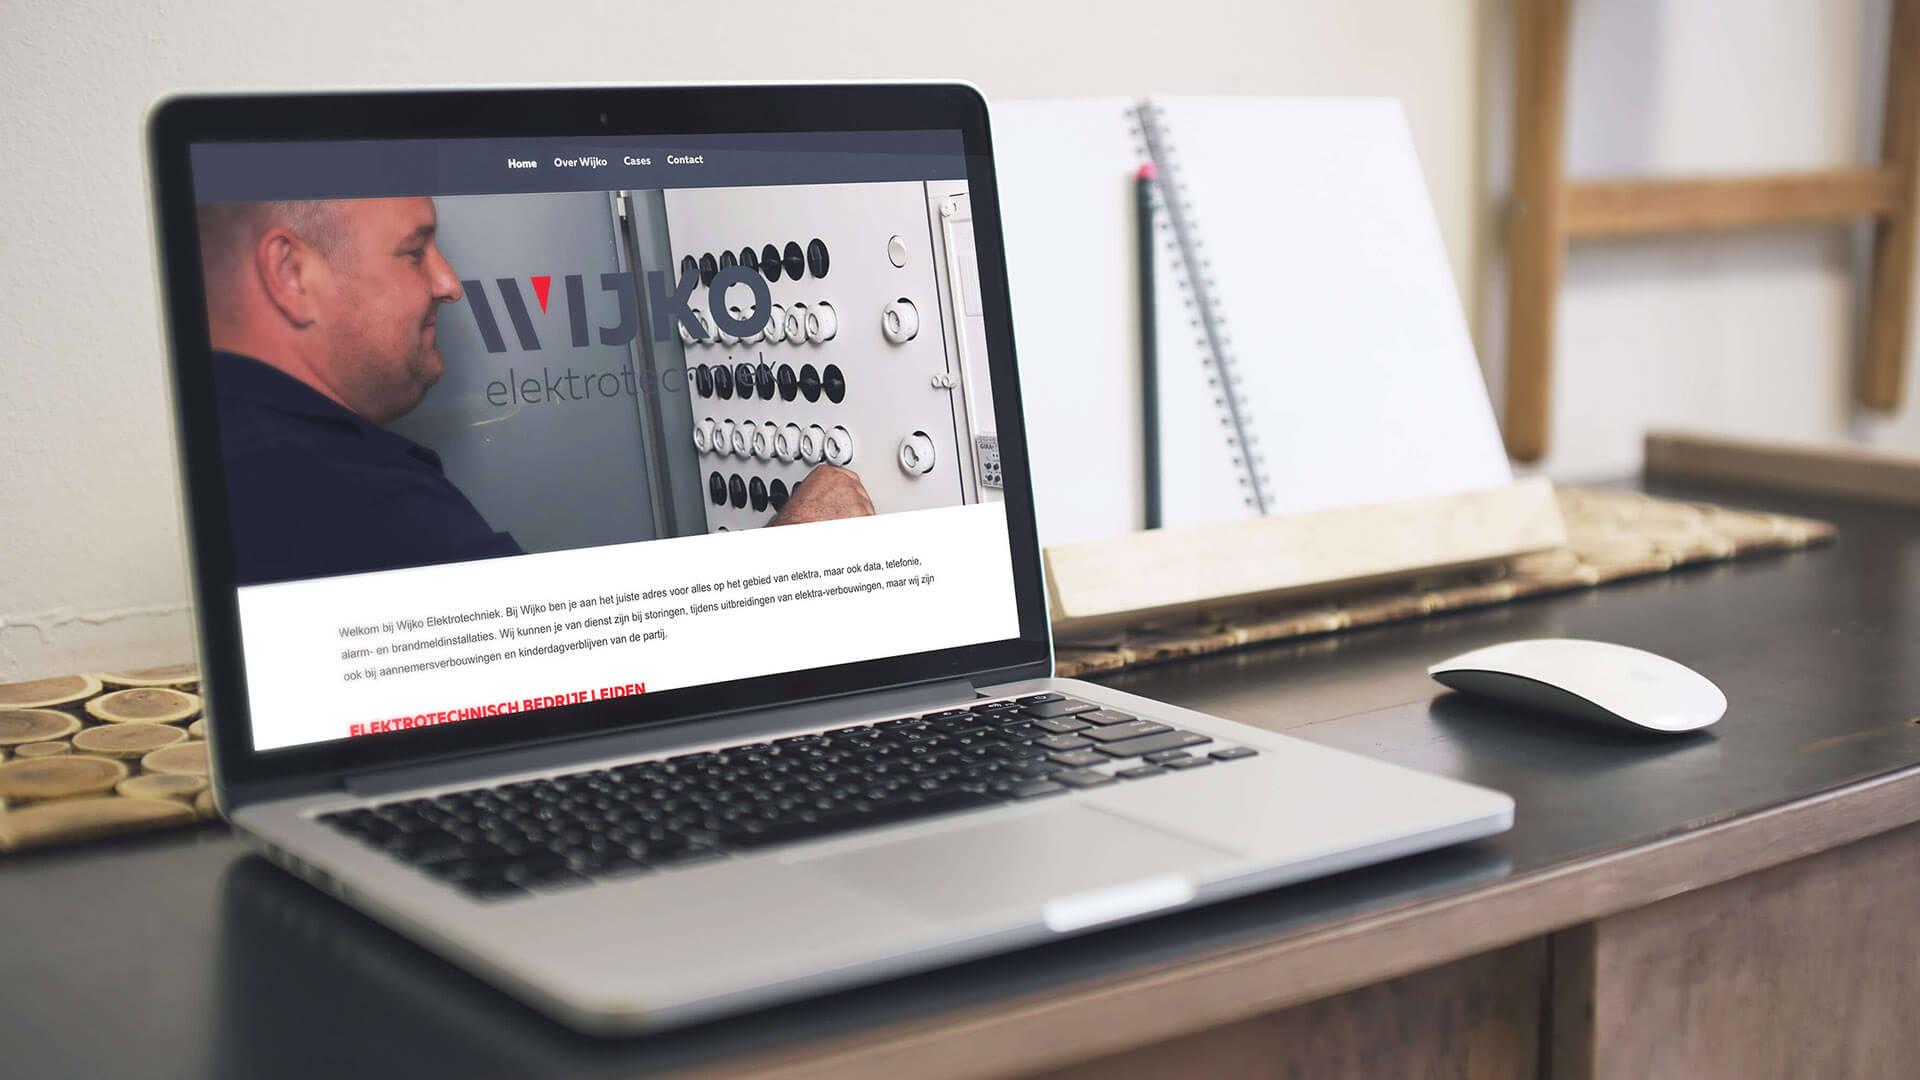 seo website, ux designer, website laten maken Rotterdam, grafisch ontwerper